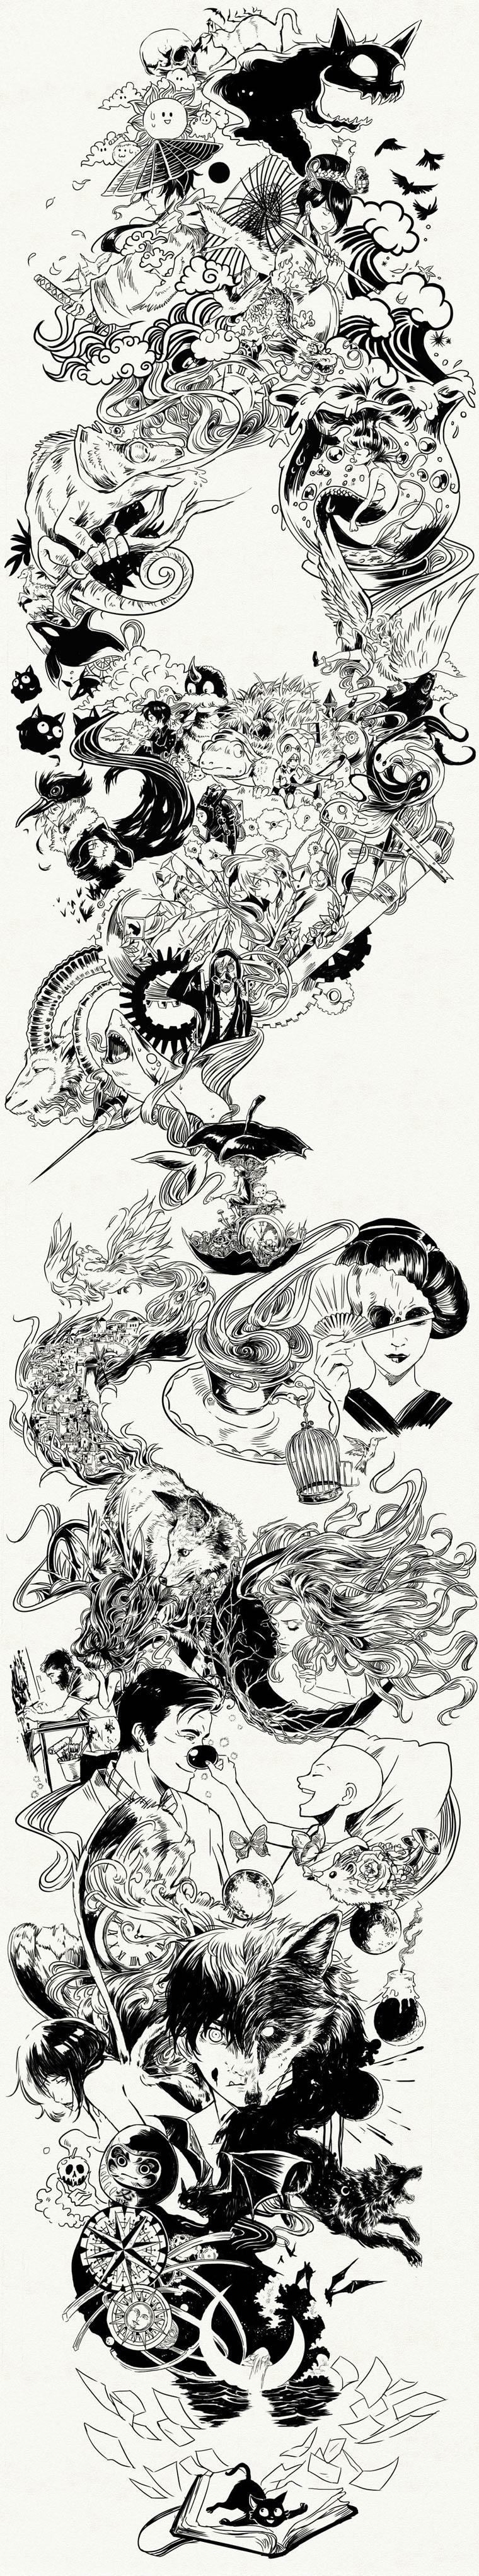 365 Days Of Doodles Gabriel Picolo (33)